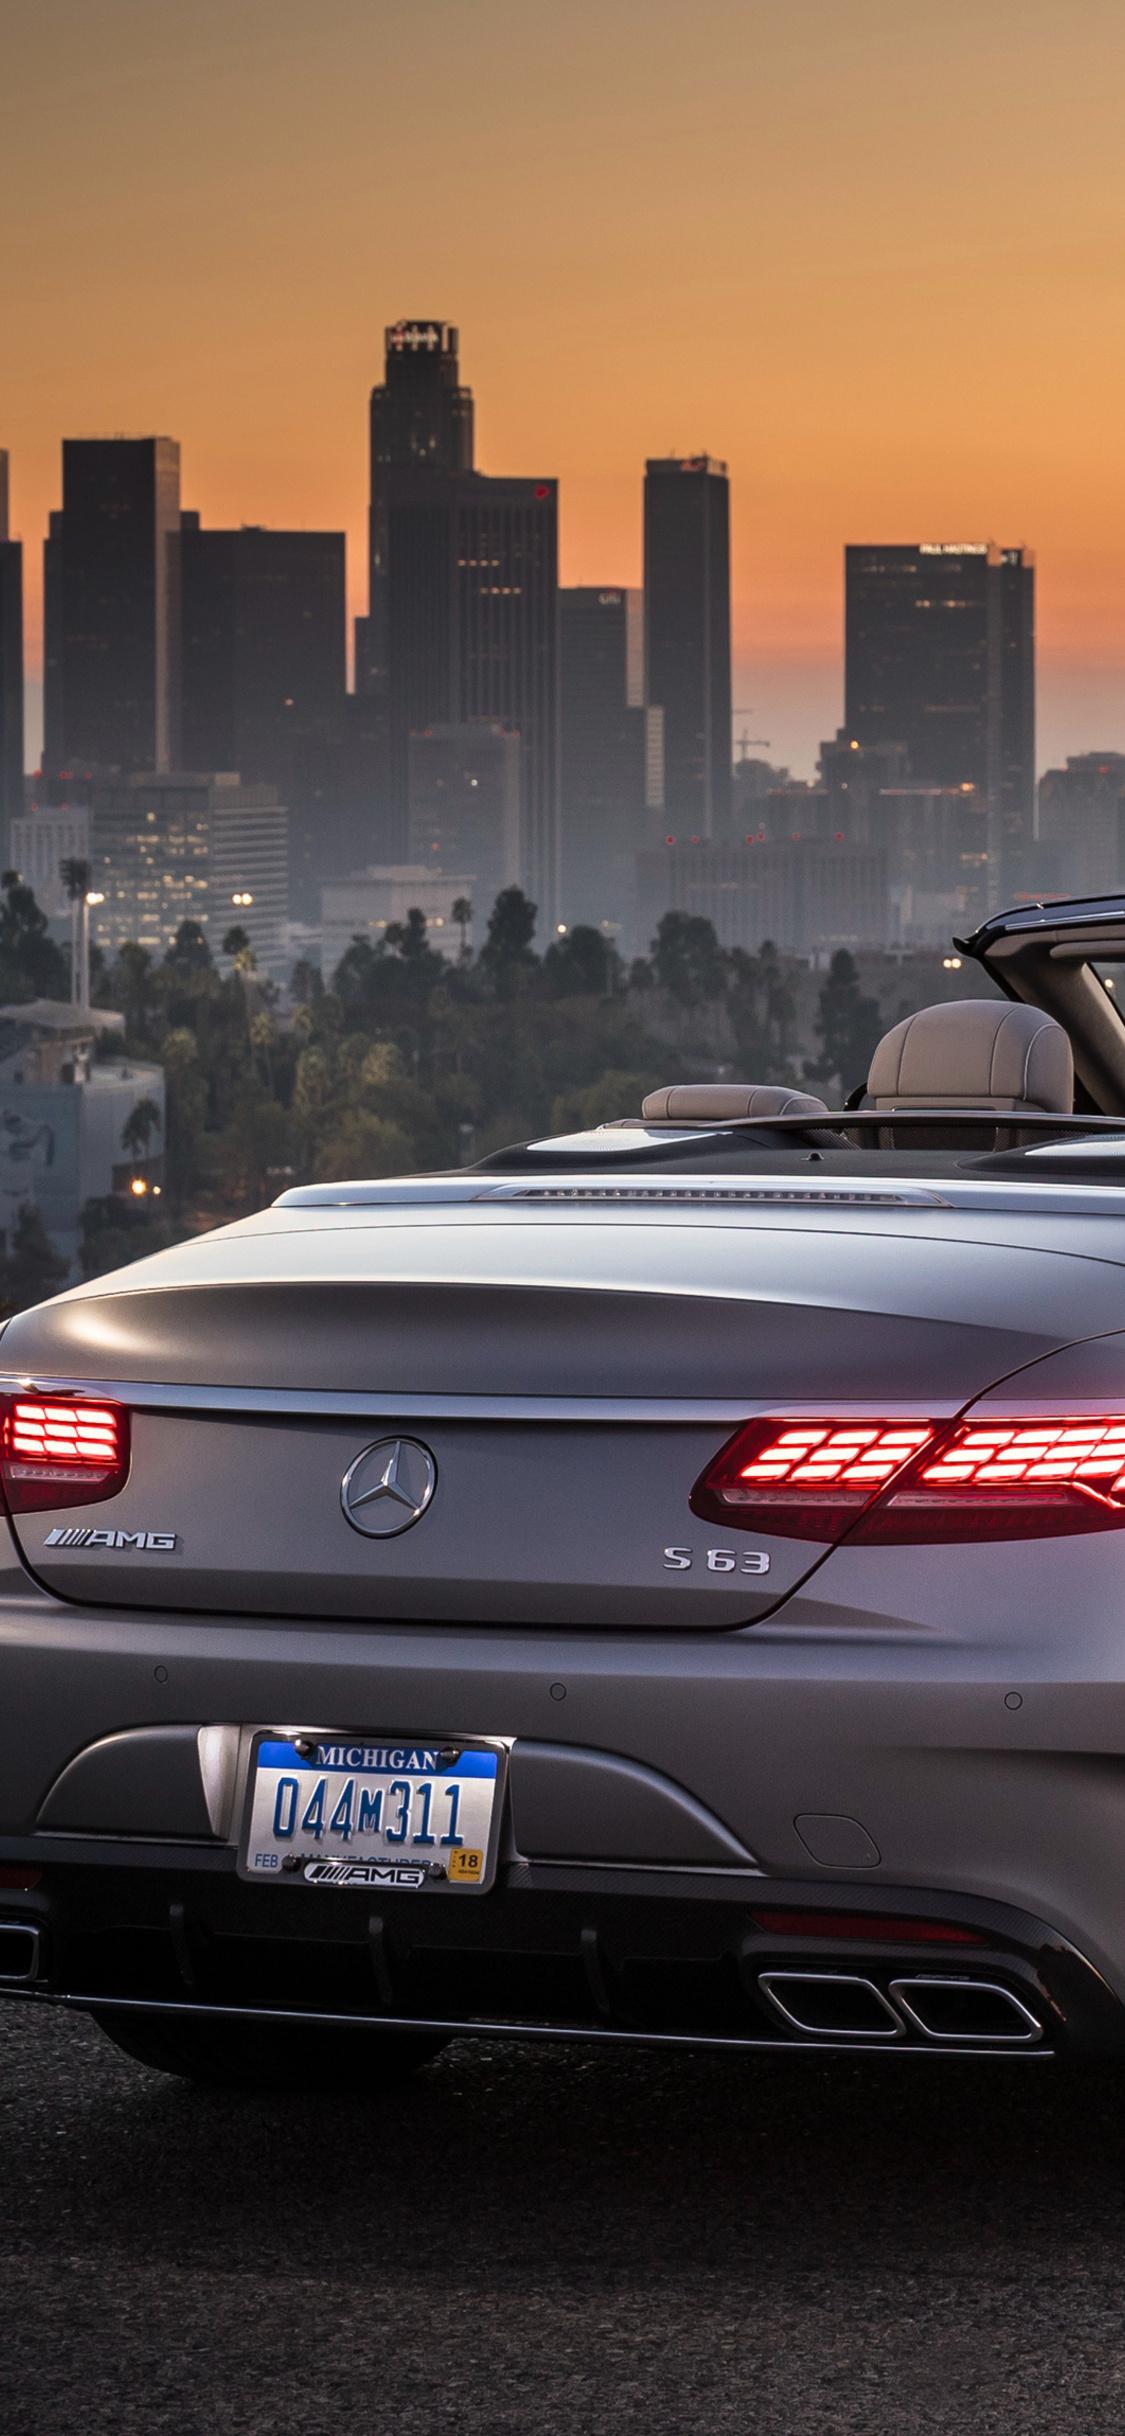 1125x2436 2019 Mercedes Amg S 63 Iphone Xs Iphone 10 Iphone X Hd 4k